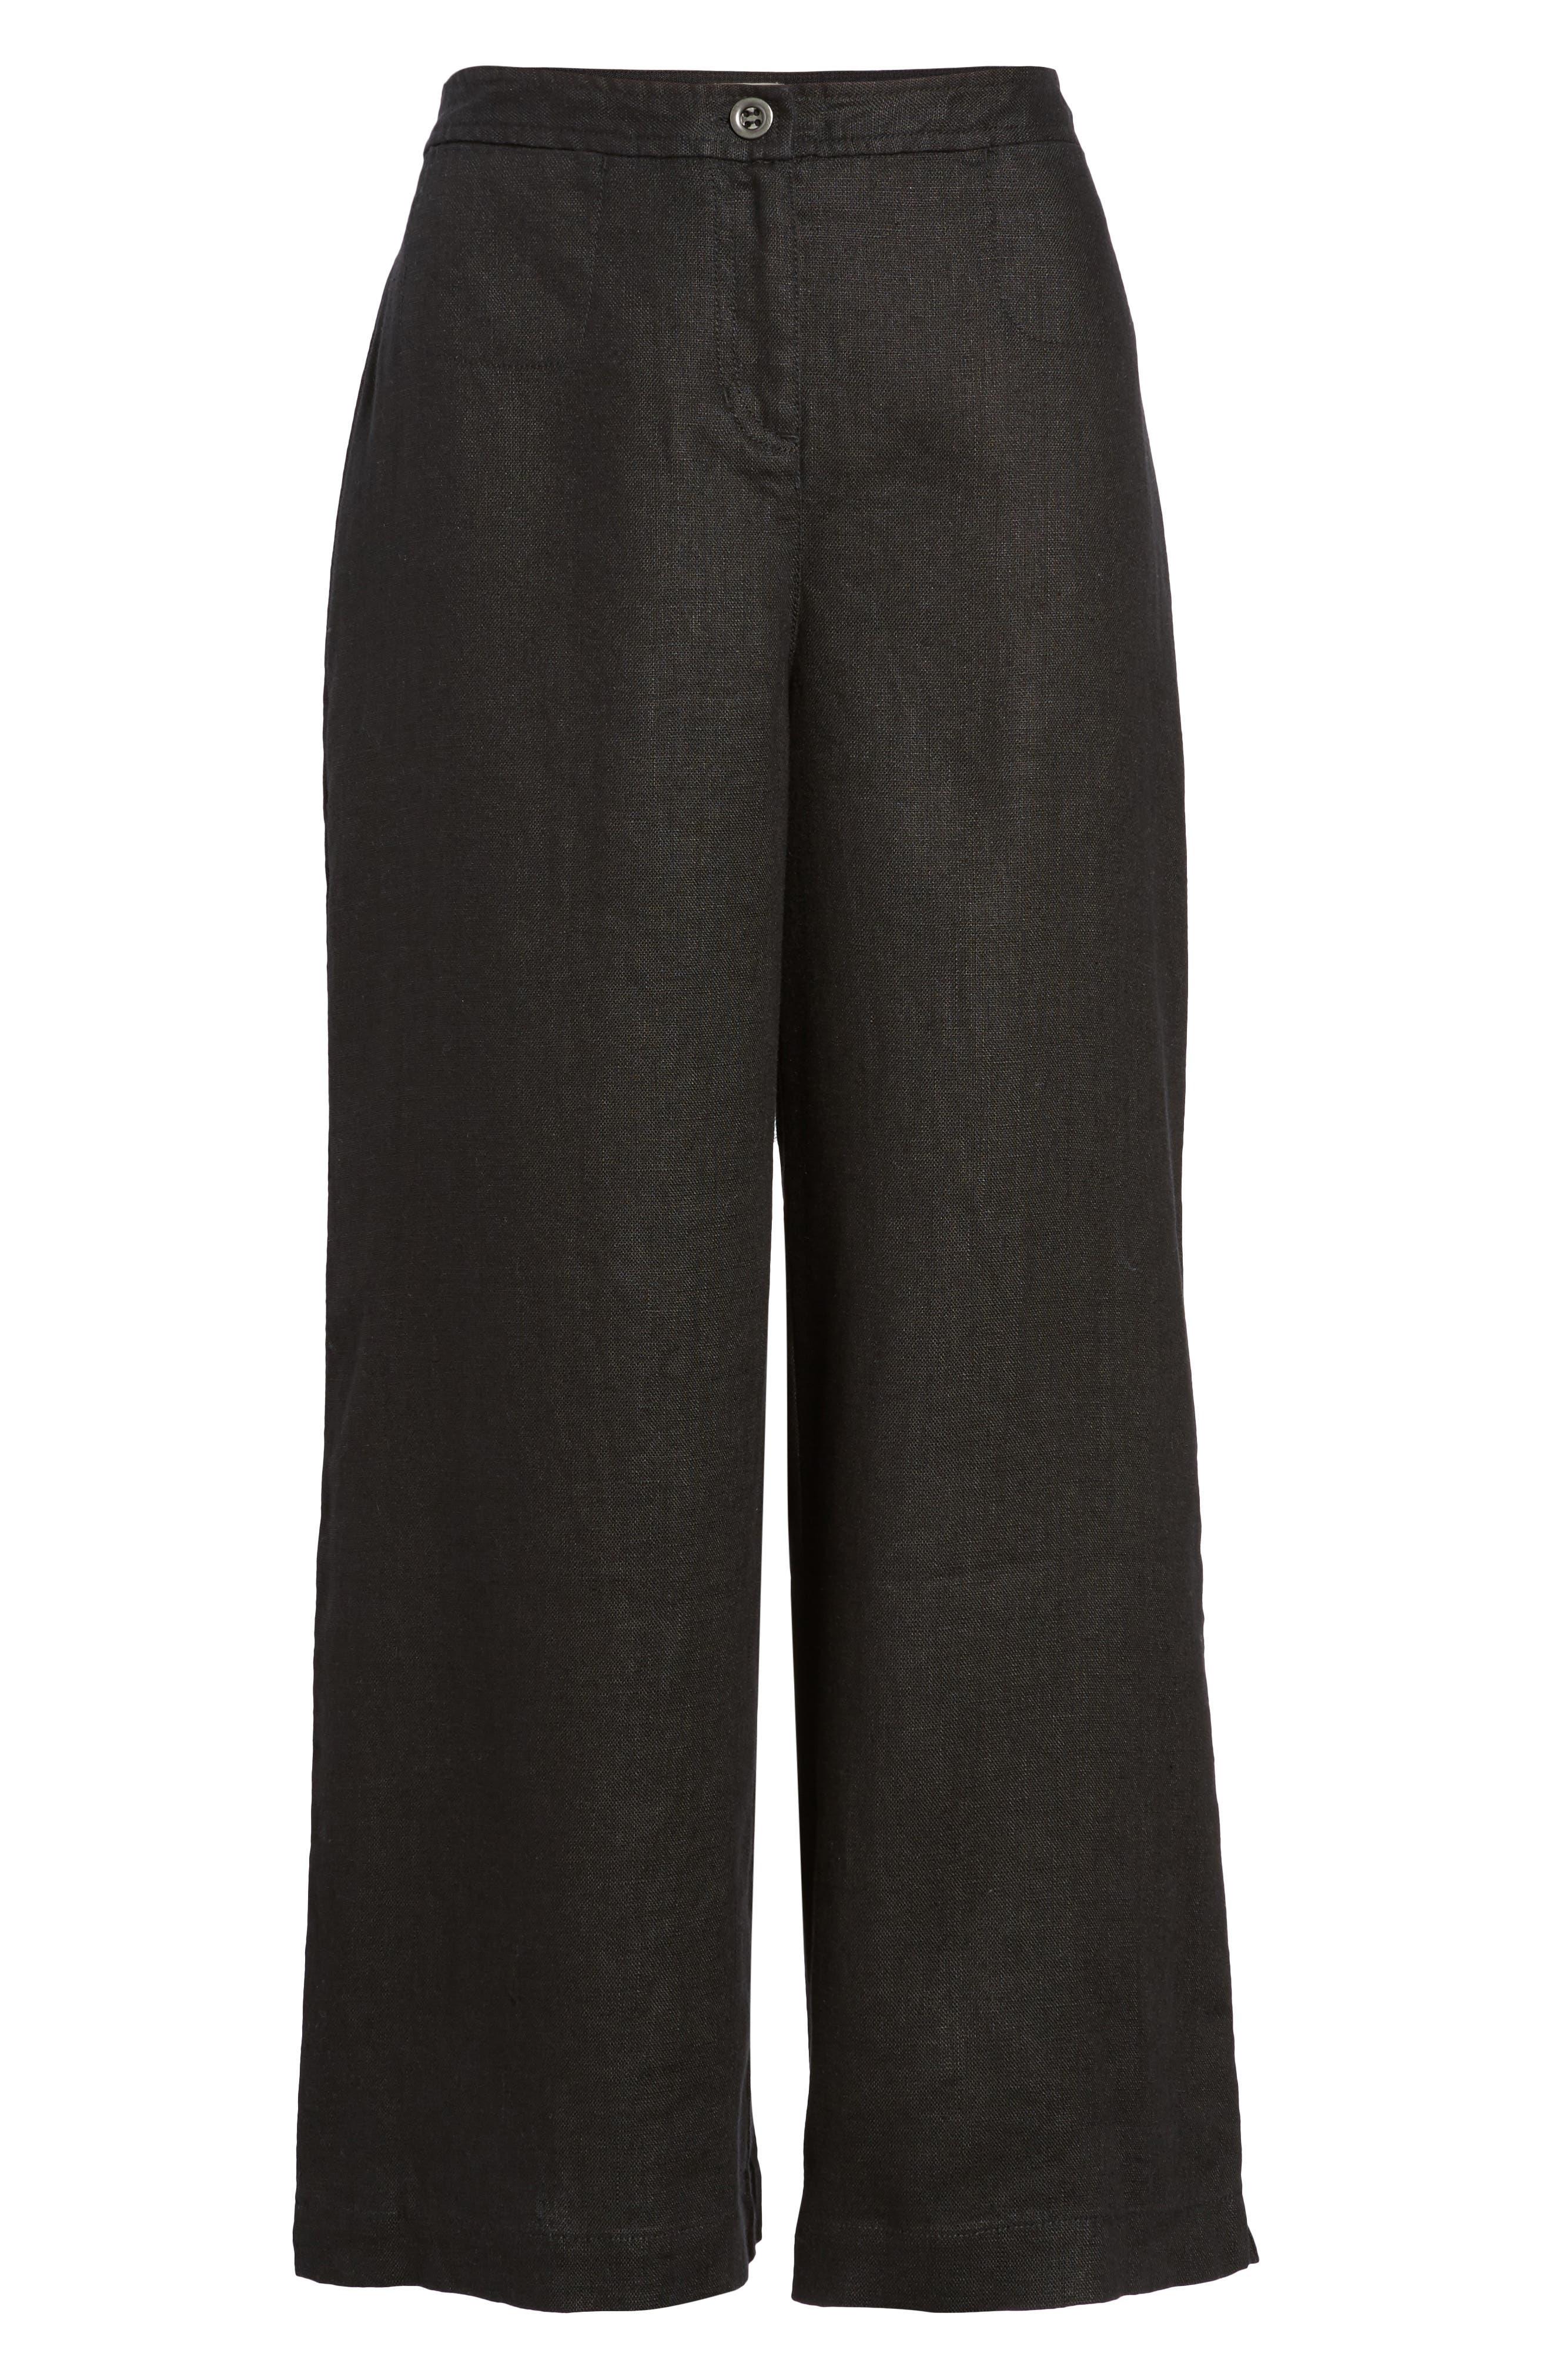 Wide Leg Organic Linen Pants,                             Alternate thumbnail 7, color,                             Black